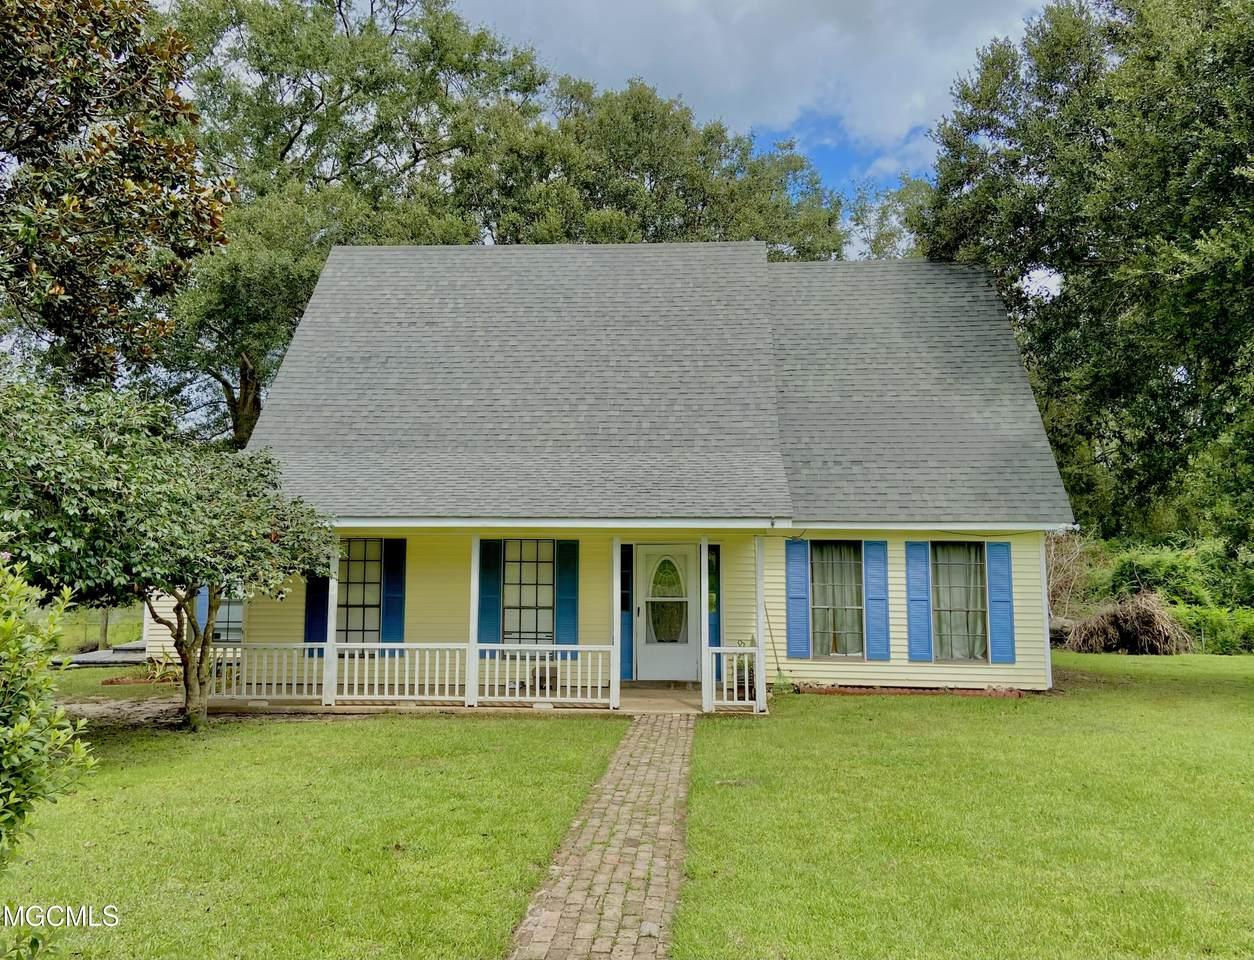 791 Savannah Millard Rd - Photo 1